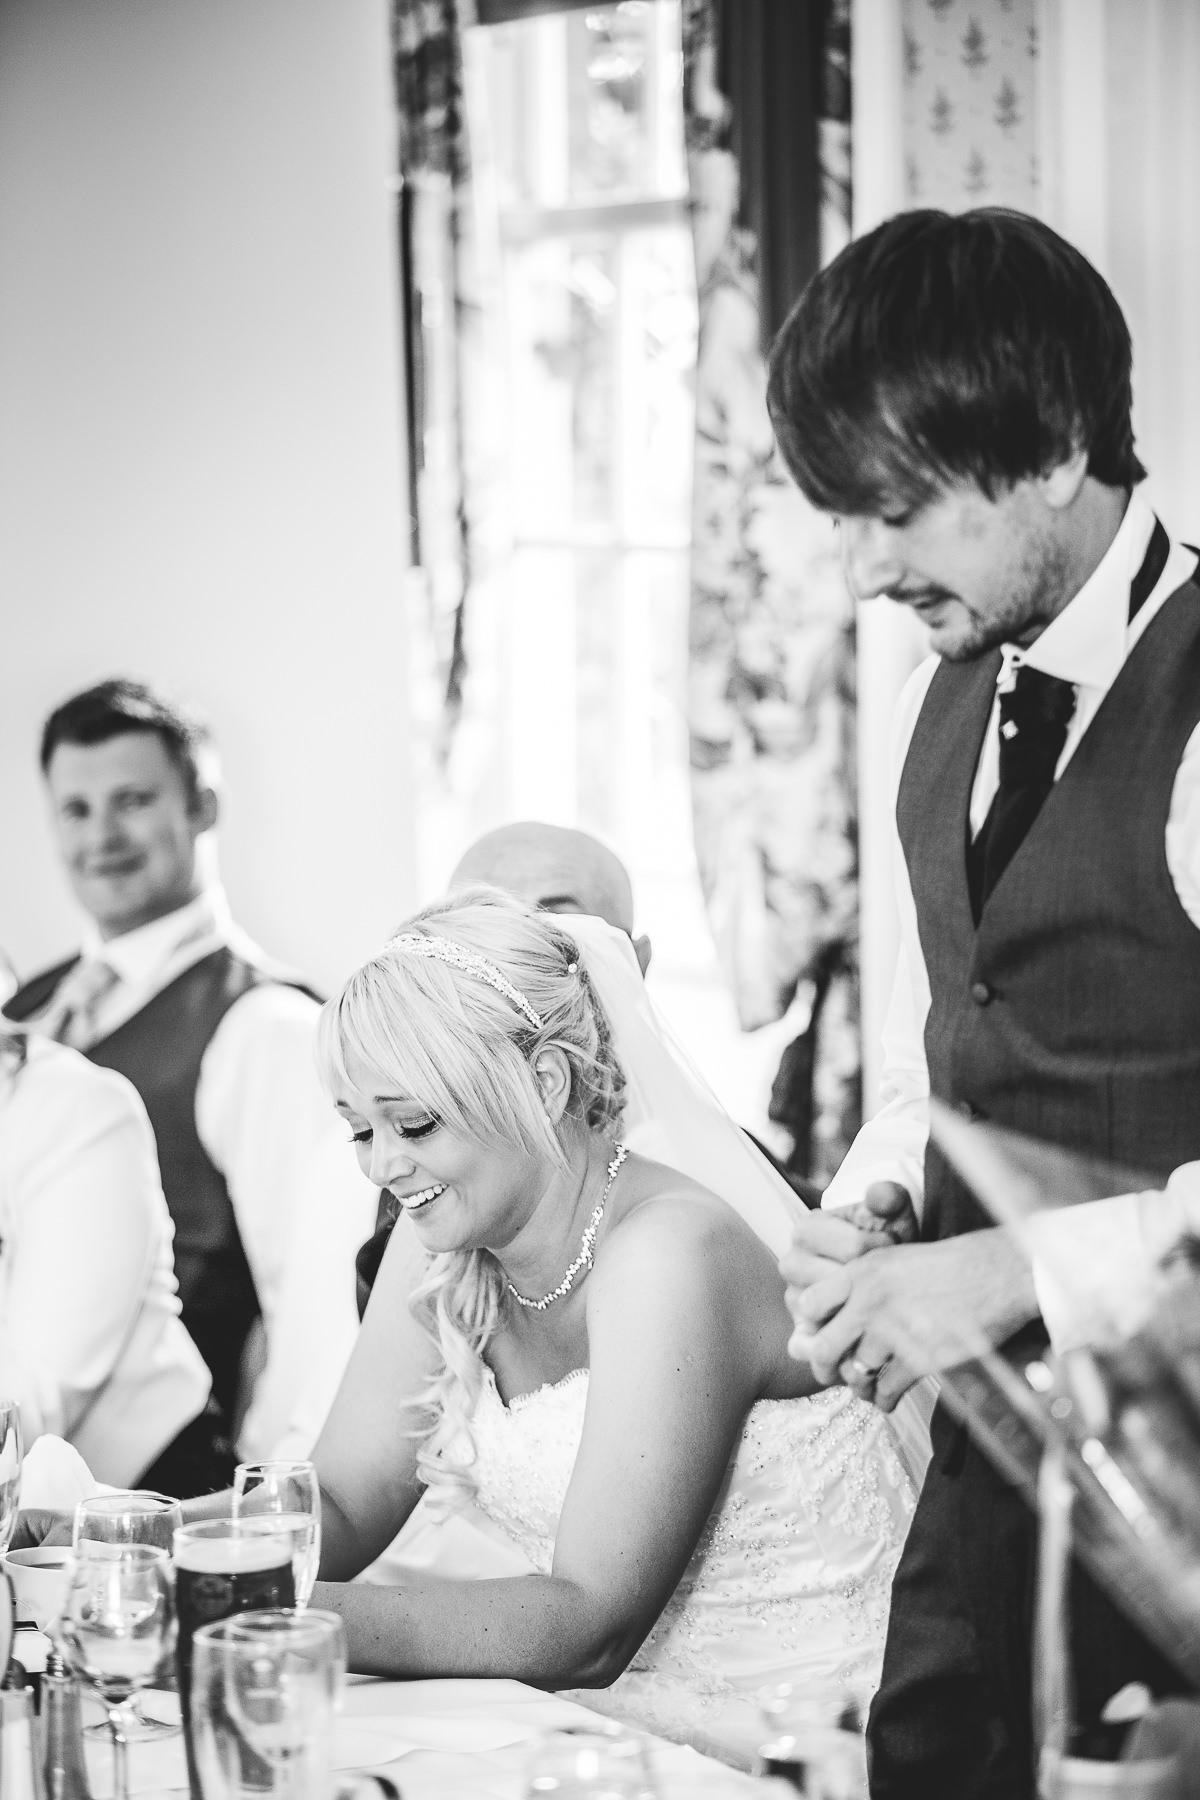 036 - Nicola and Dan - Park House Hotel Shifnal Wedding